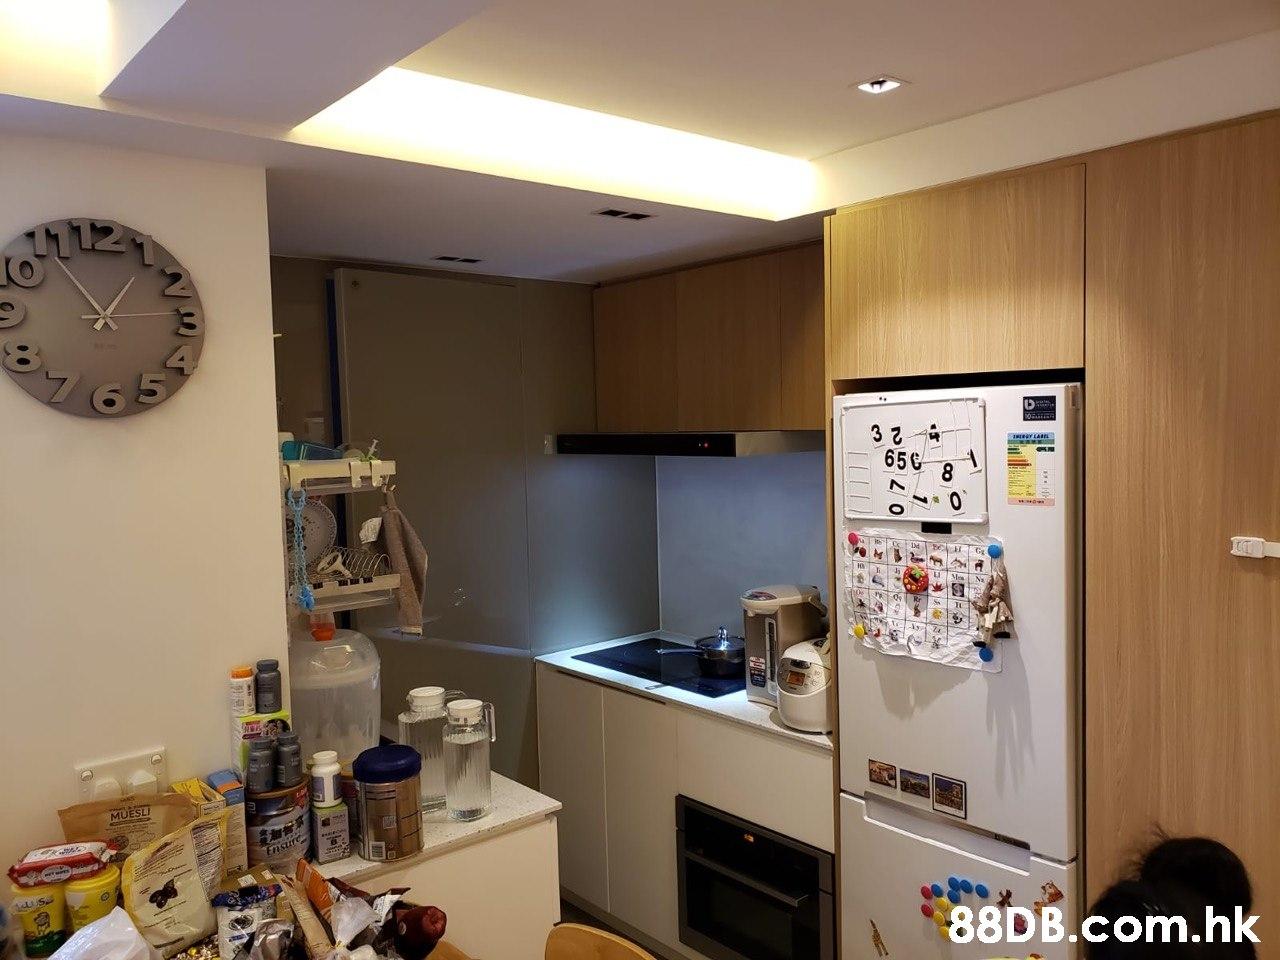 4 3 2 4 65C CO 10 MUESLI Ensure .hk  Room,Property,Ceiling,Building,Interior design